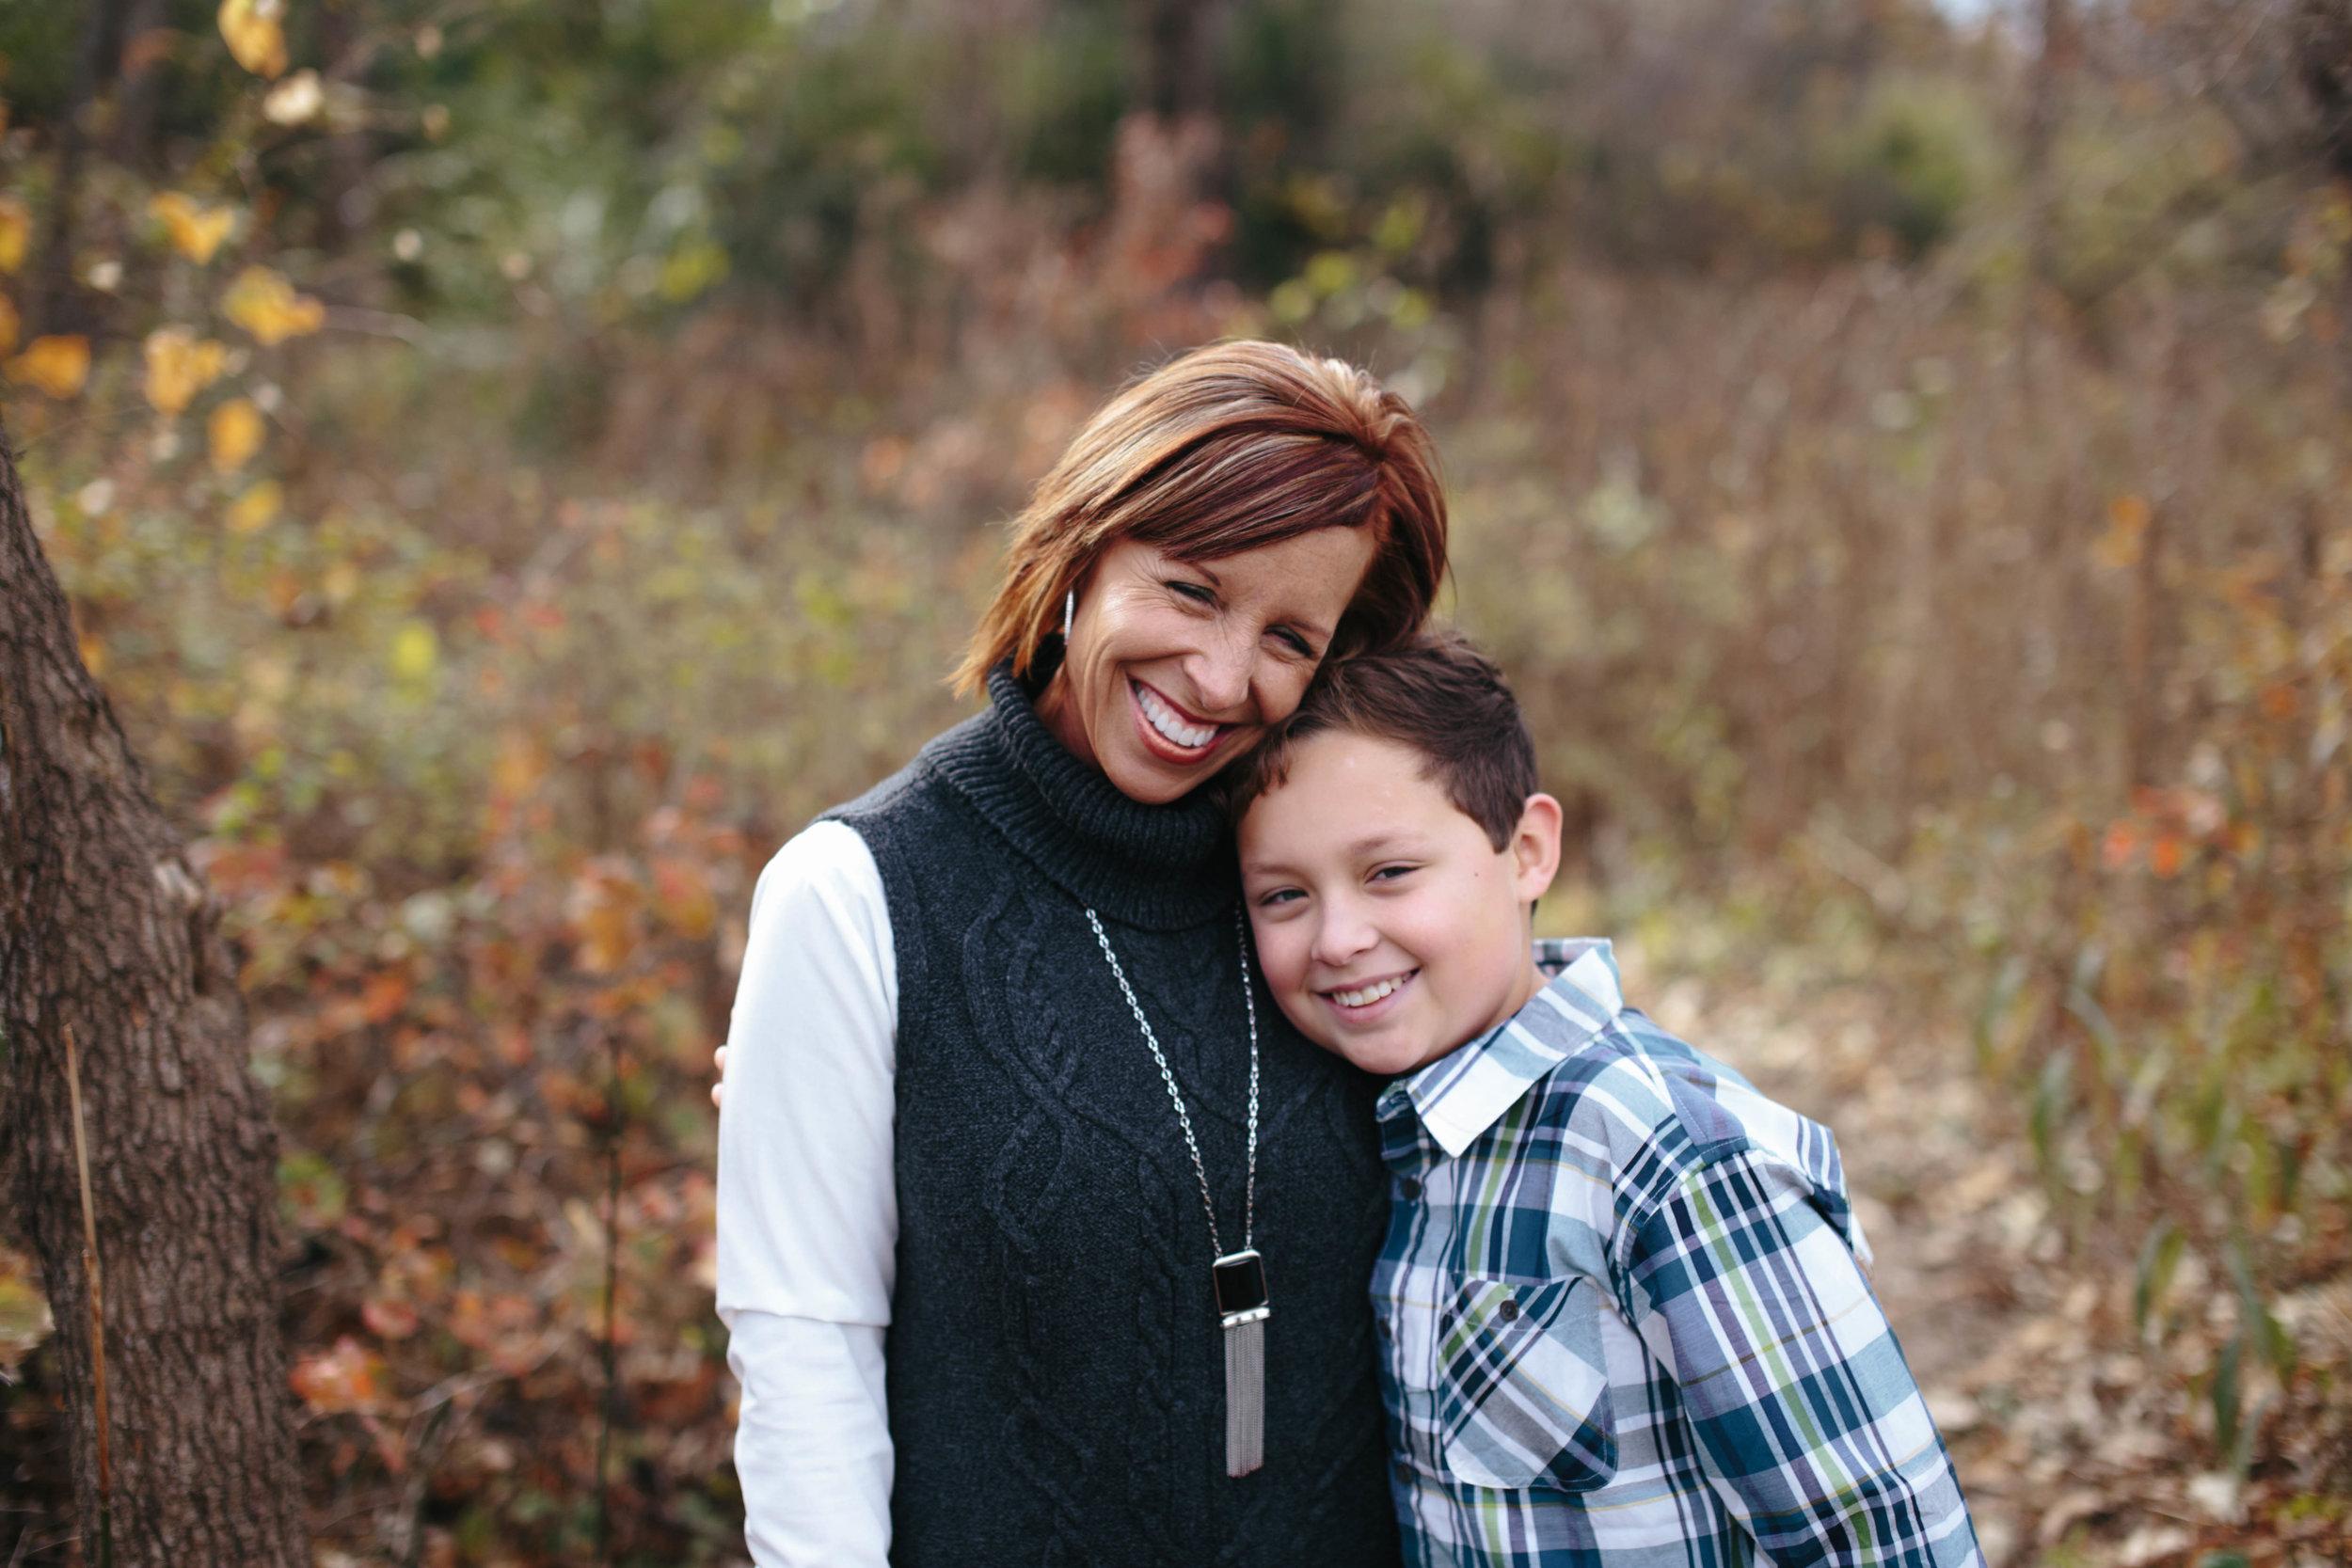 The Reber Family | Kansas City, MO | Hannahill Photography | Fall Family session at Ironwoods